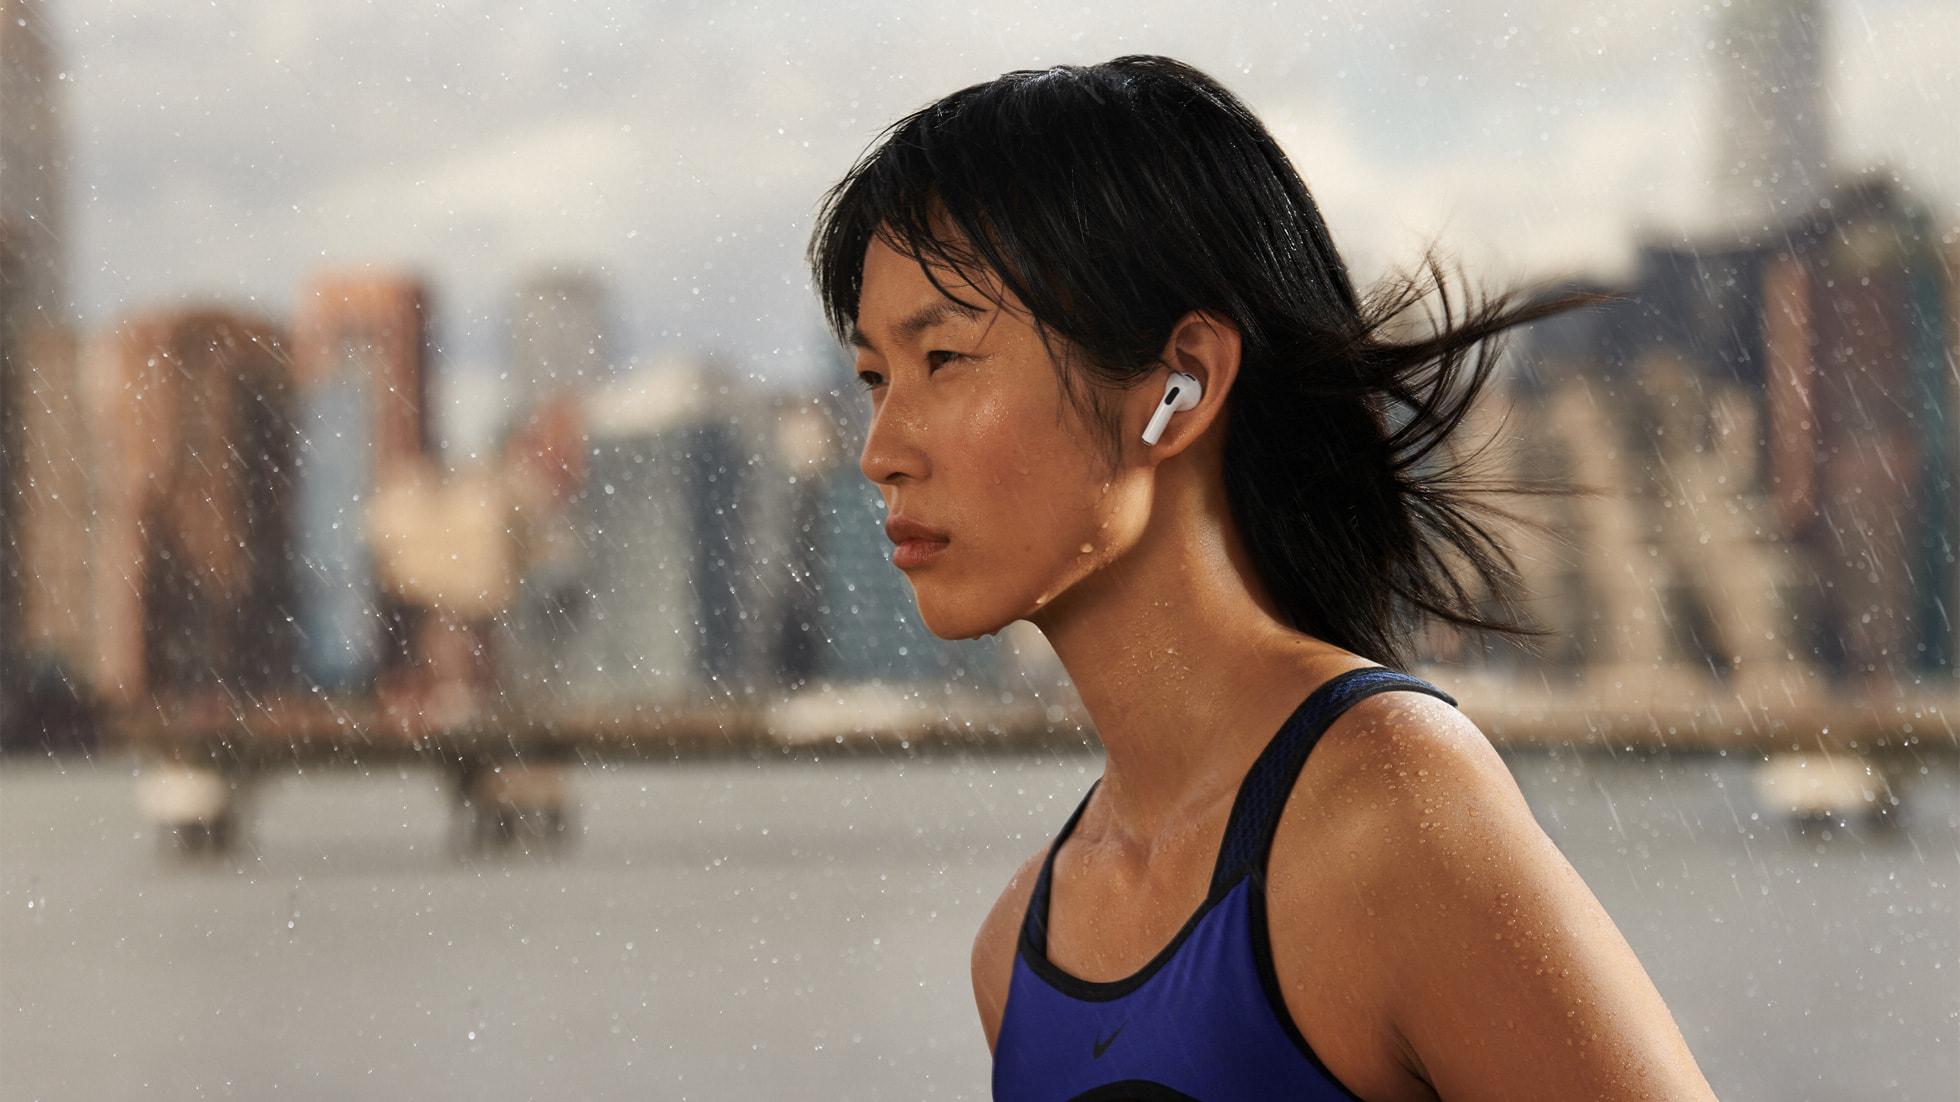 Apple AirPods 3rd gen lifestyle 01 10182021 big